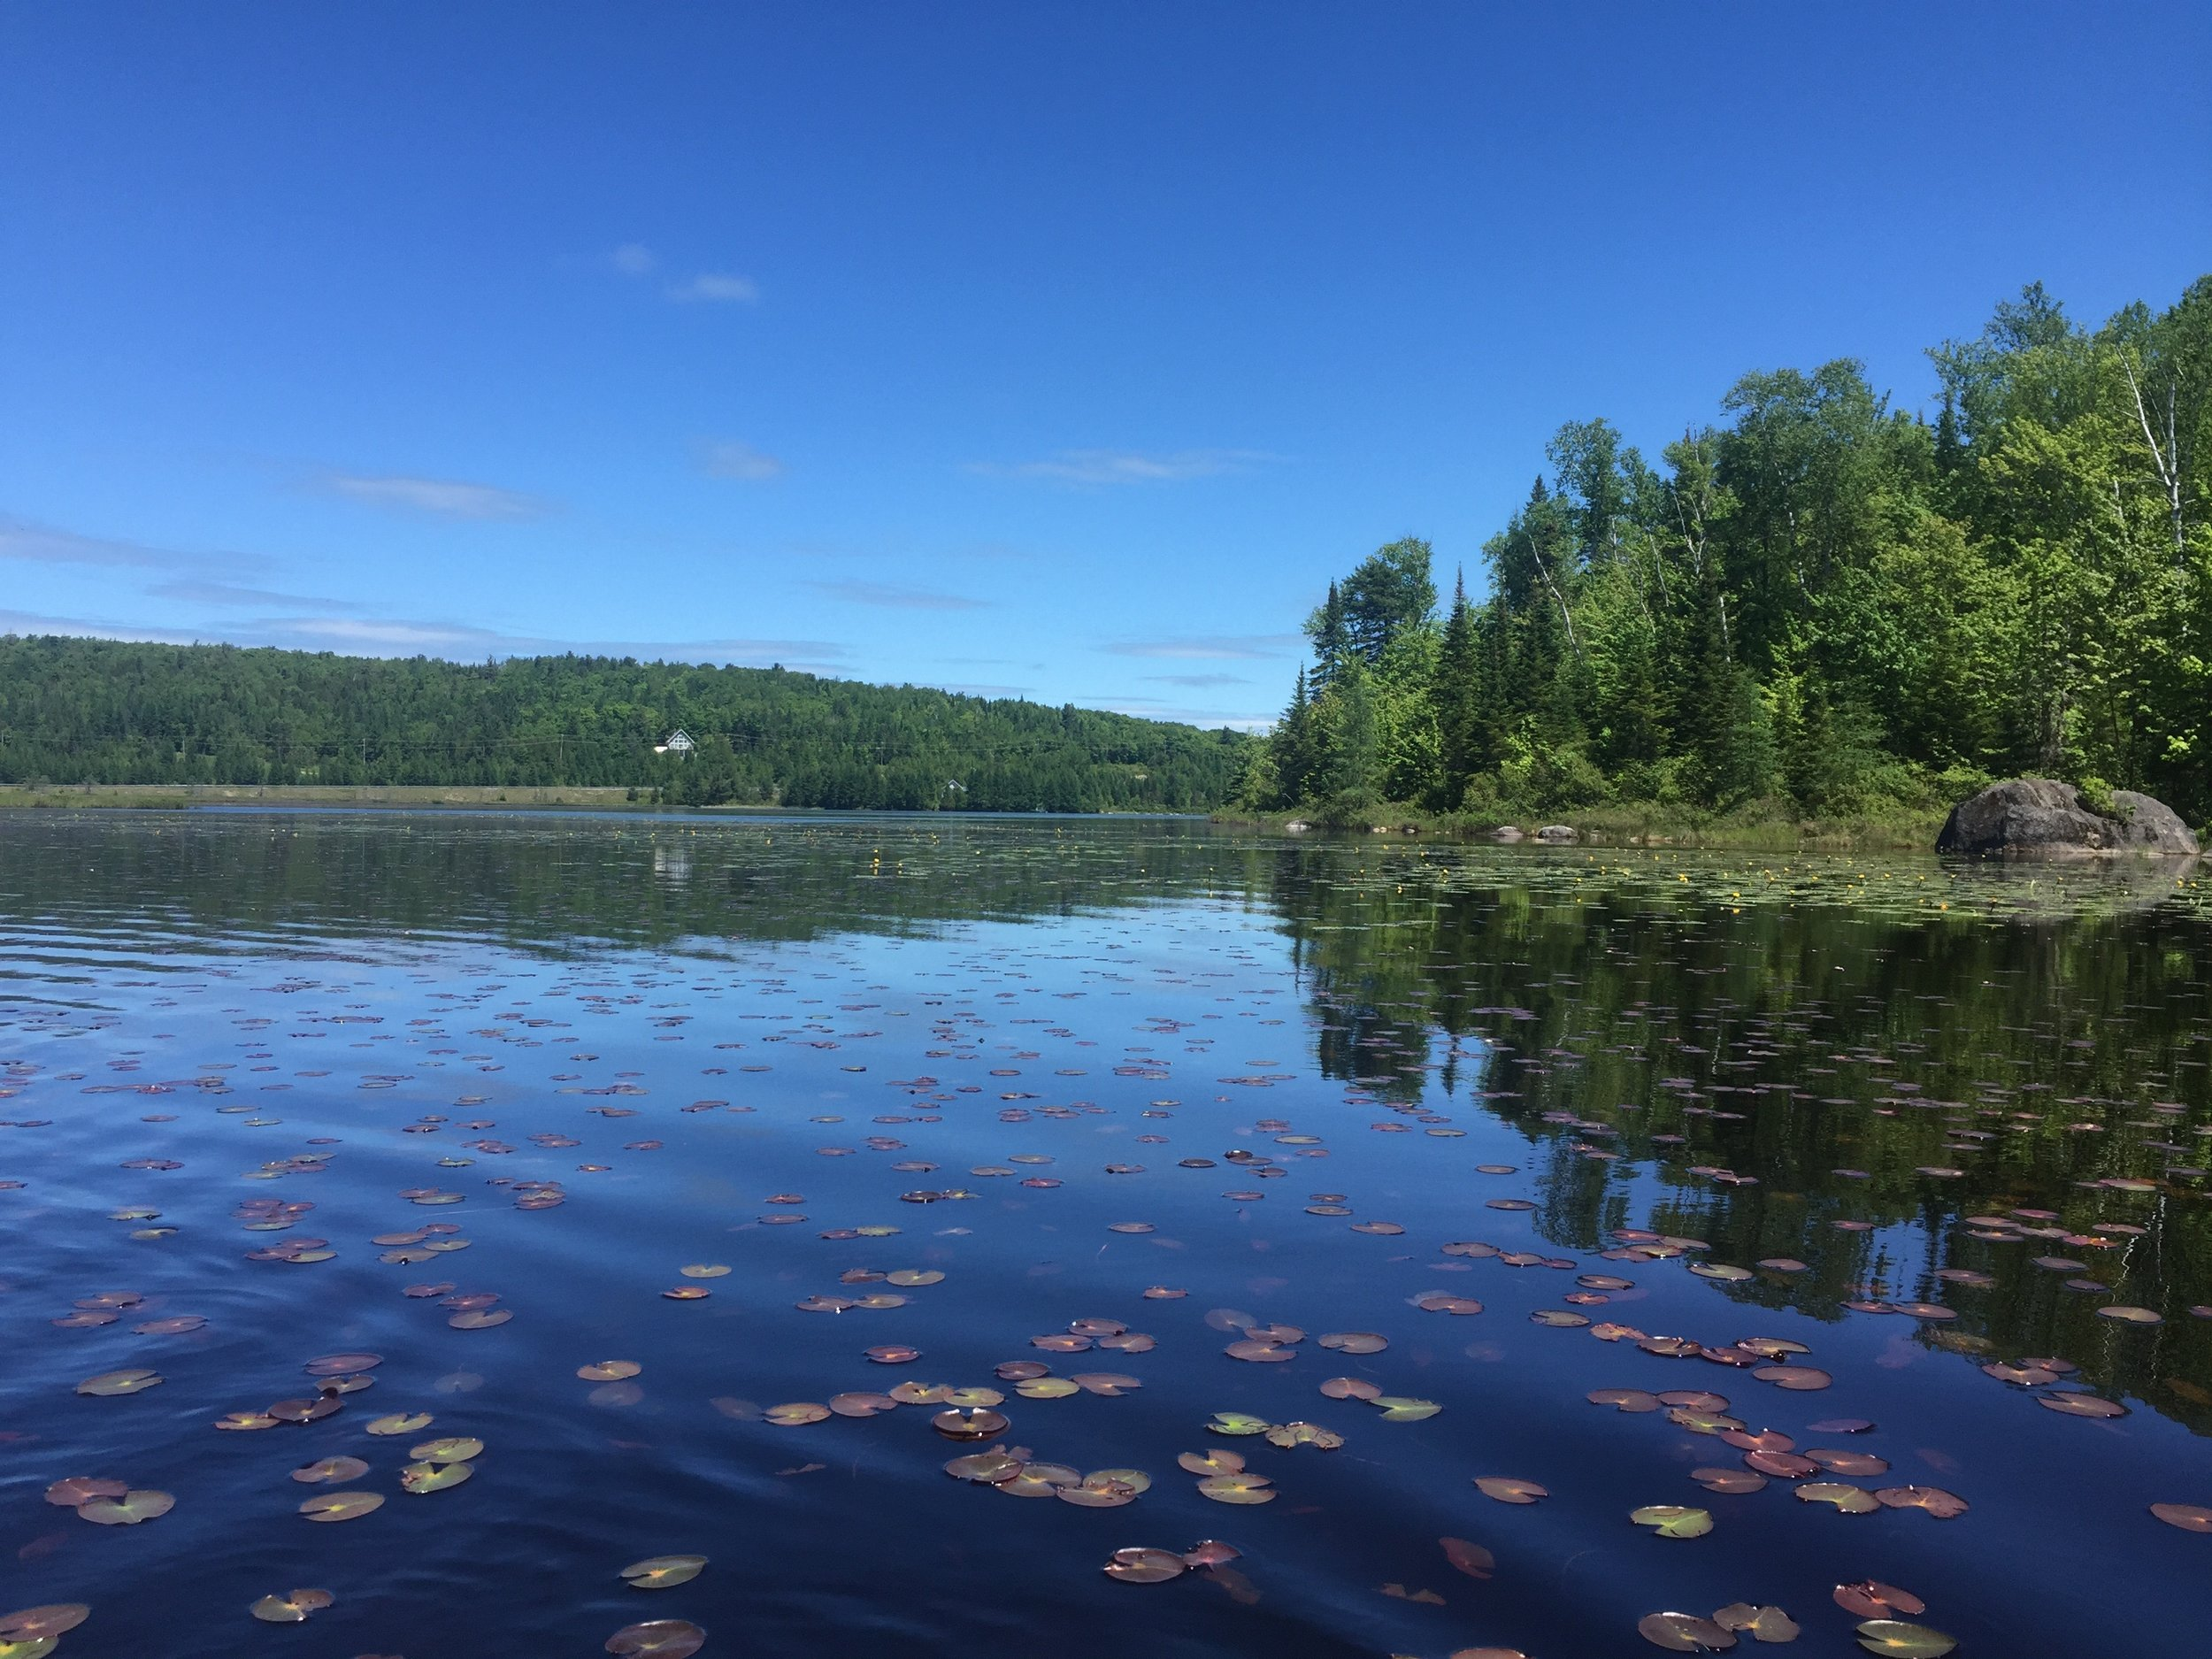 Chalet a Louer Lac Laurentides Lanaudiere Quebec 7.jpg